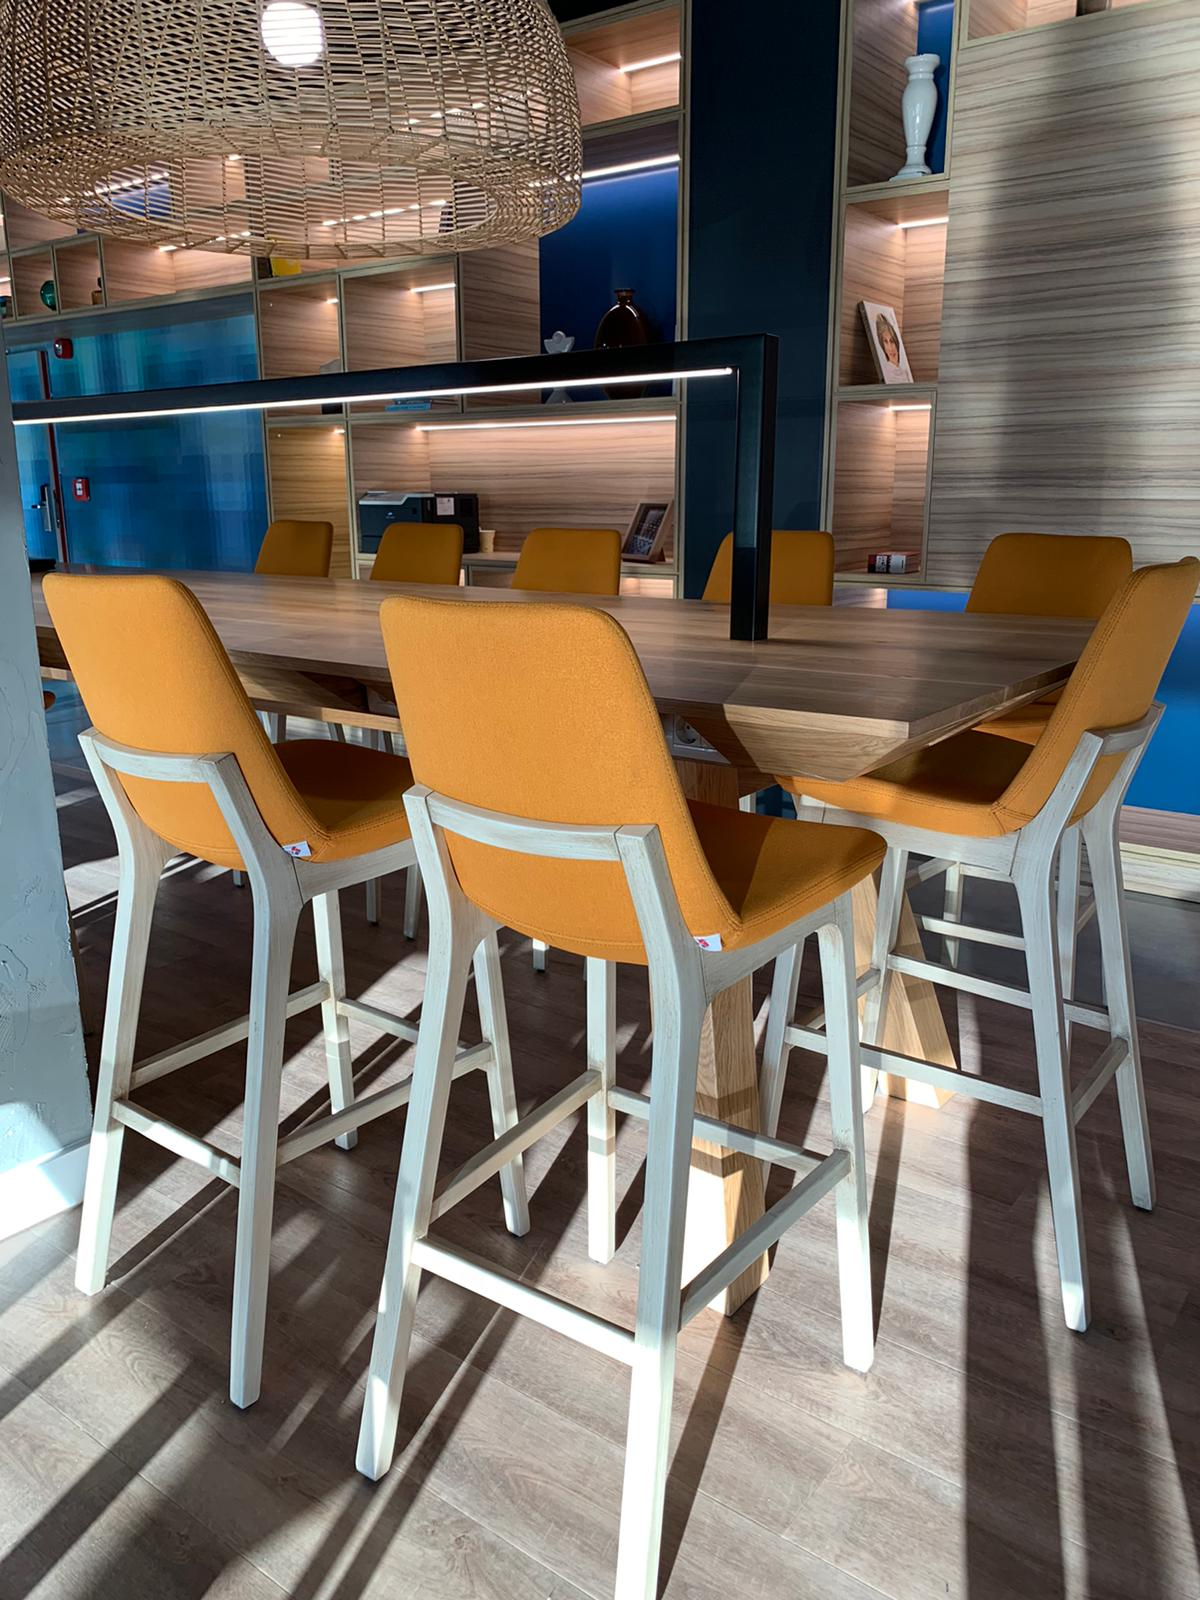 proiect Chairry hotel ibis Timisoara